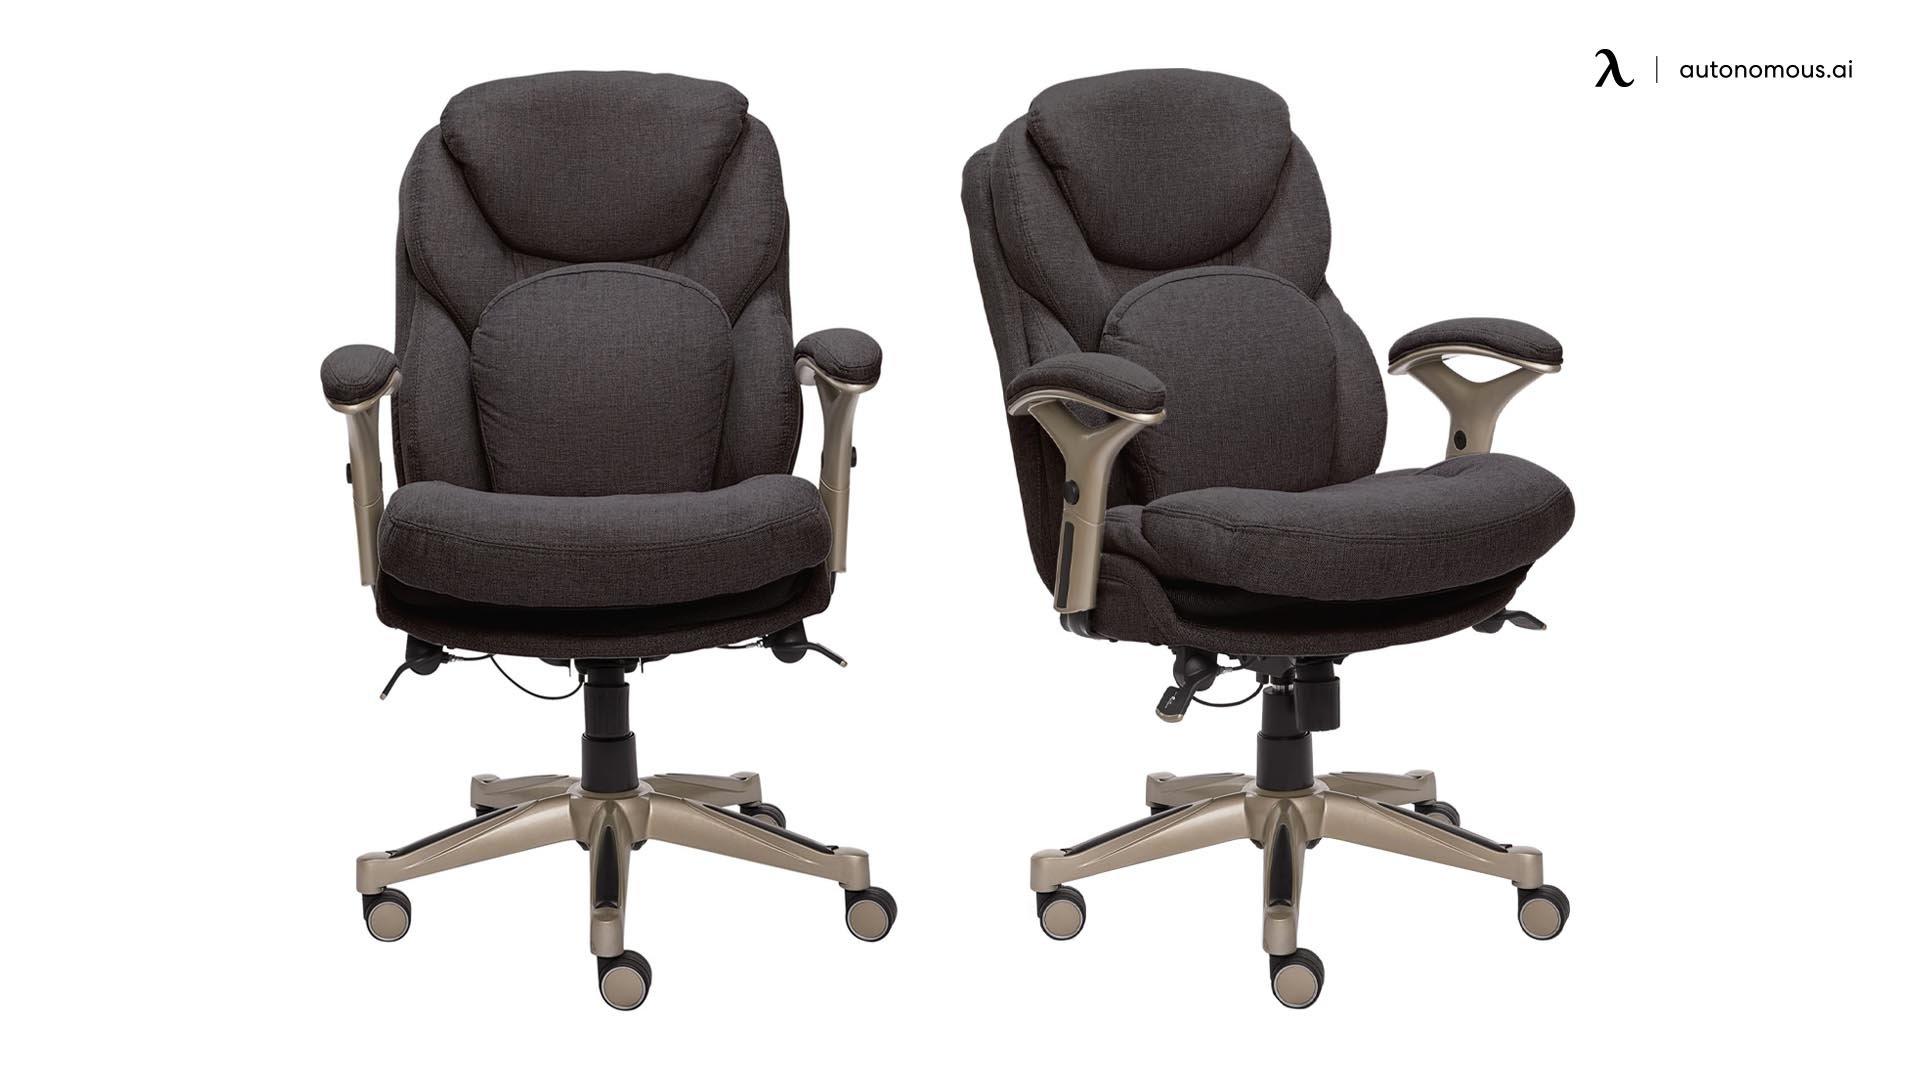 Serta Mid-Back Office Chair